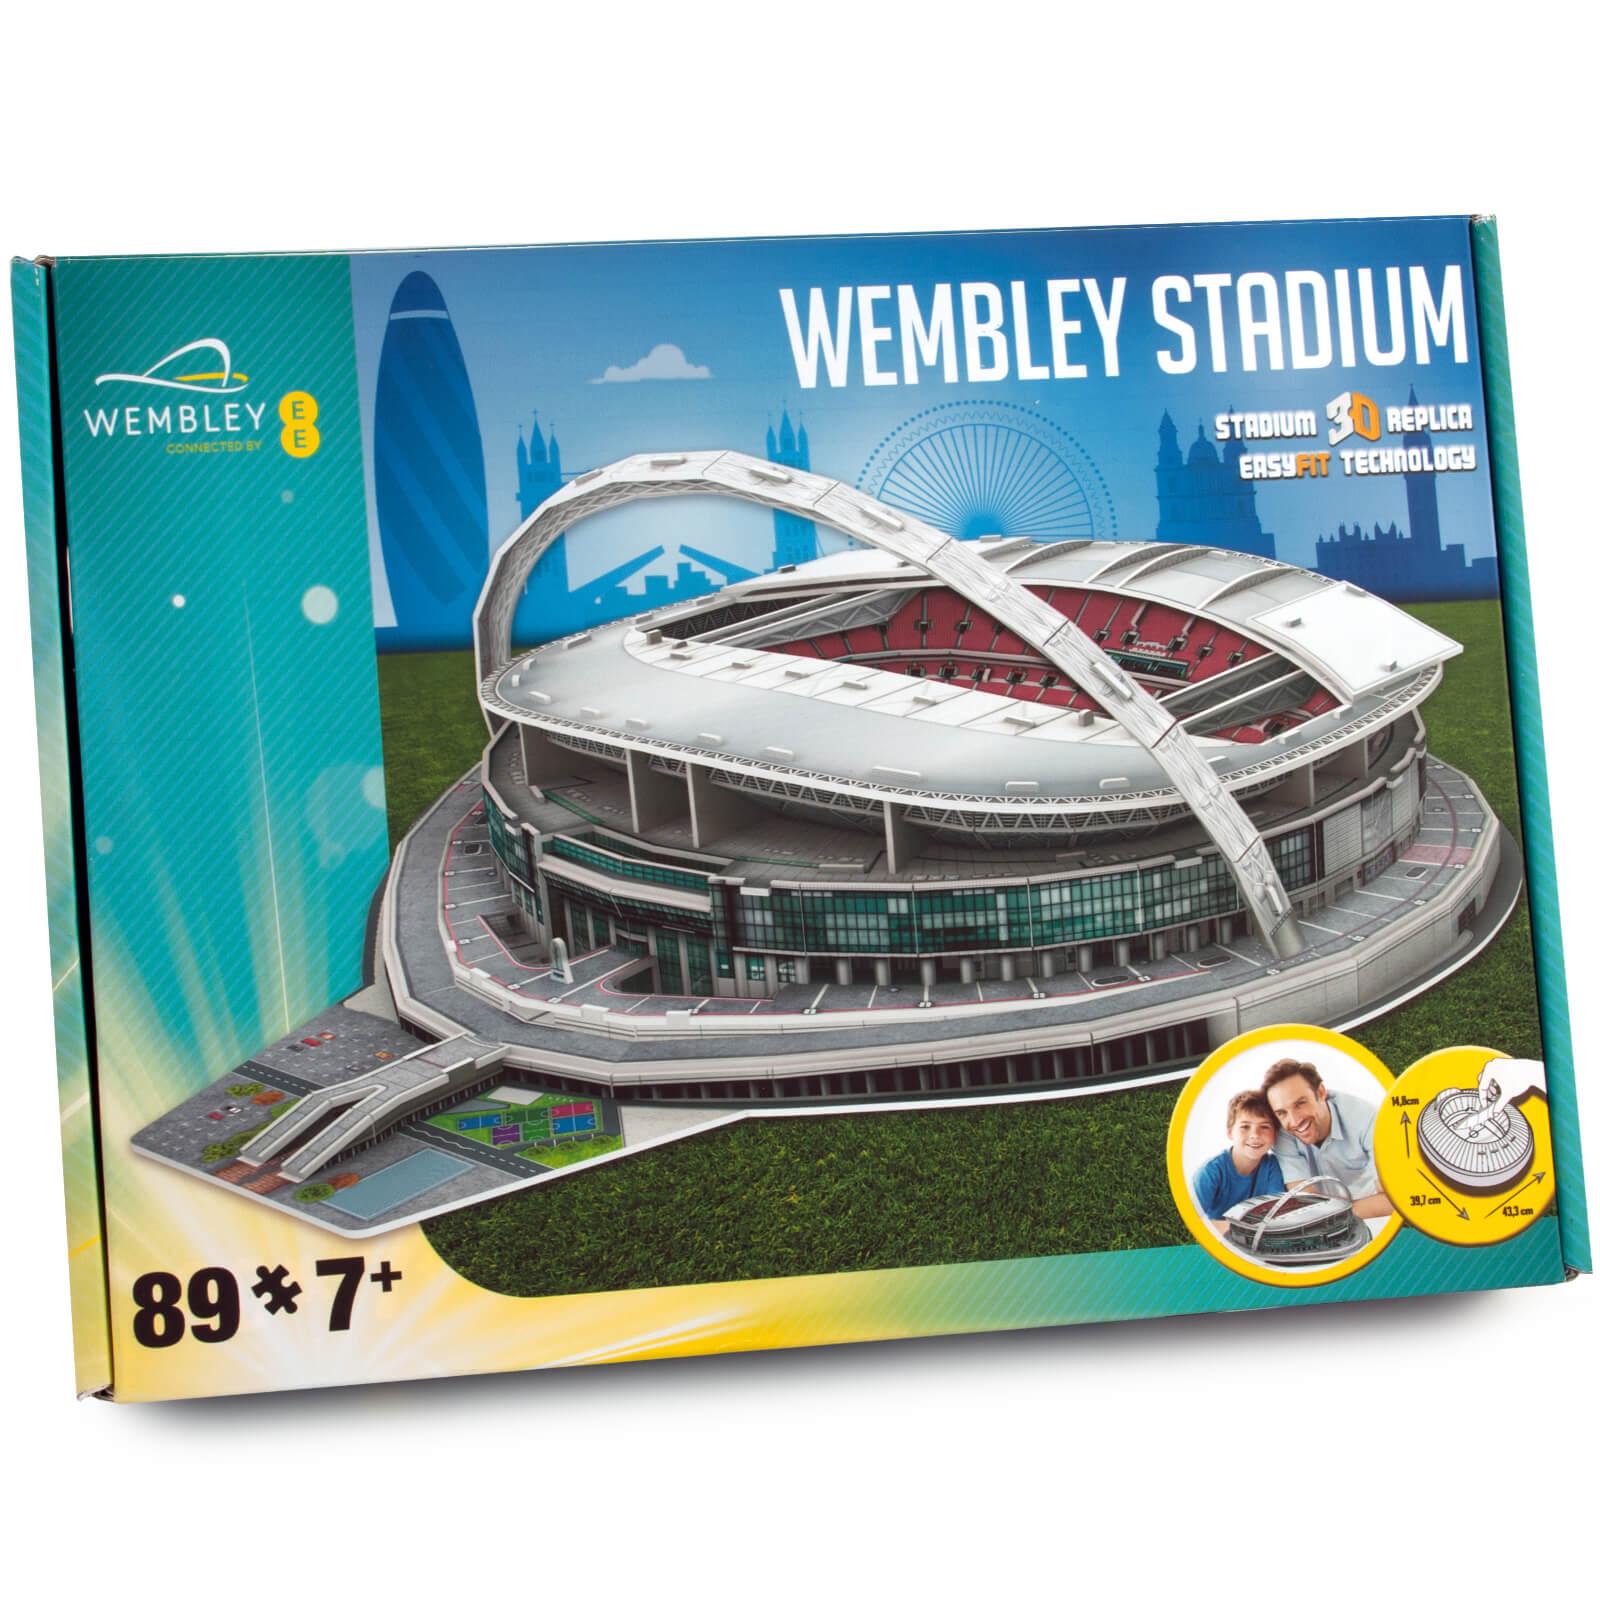 Paul Lamond Games 3D Puzzle Football Stadium - Wembley